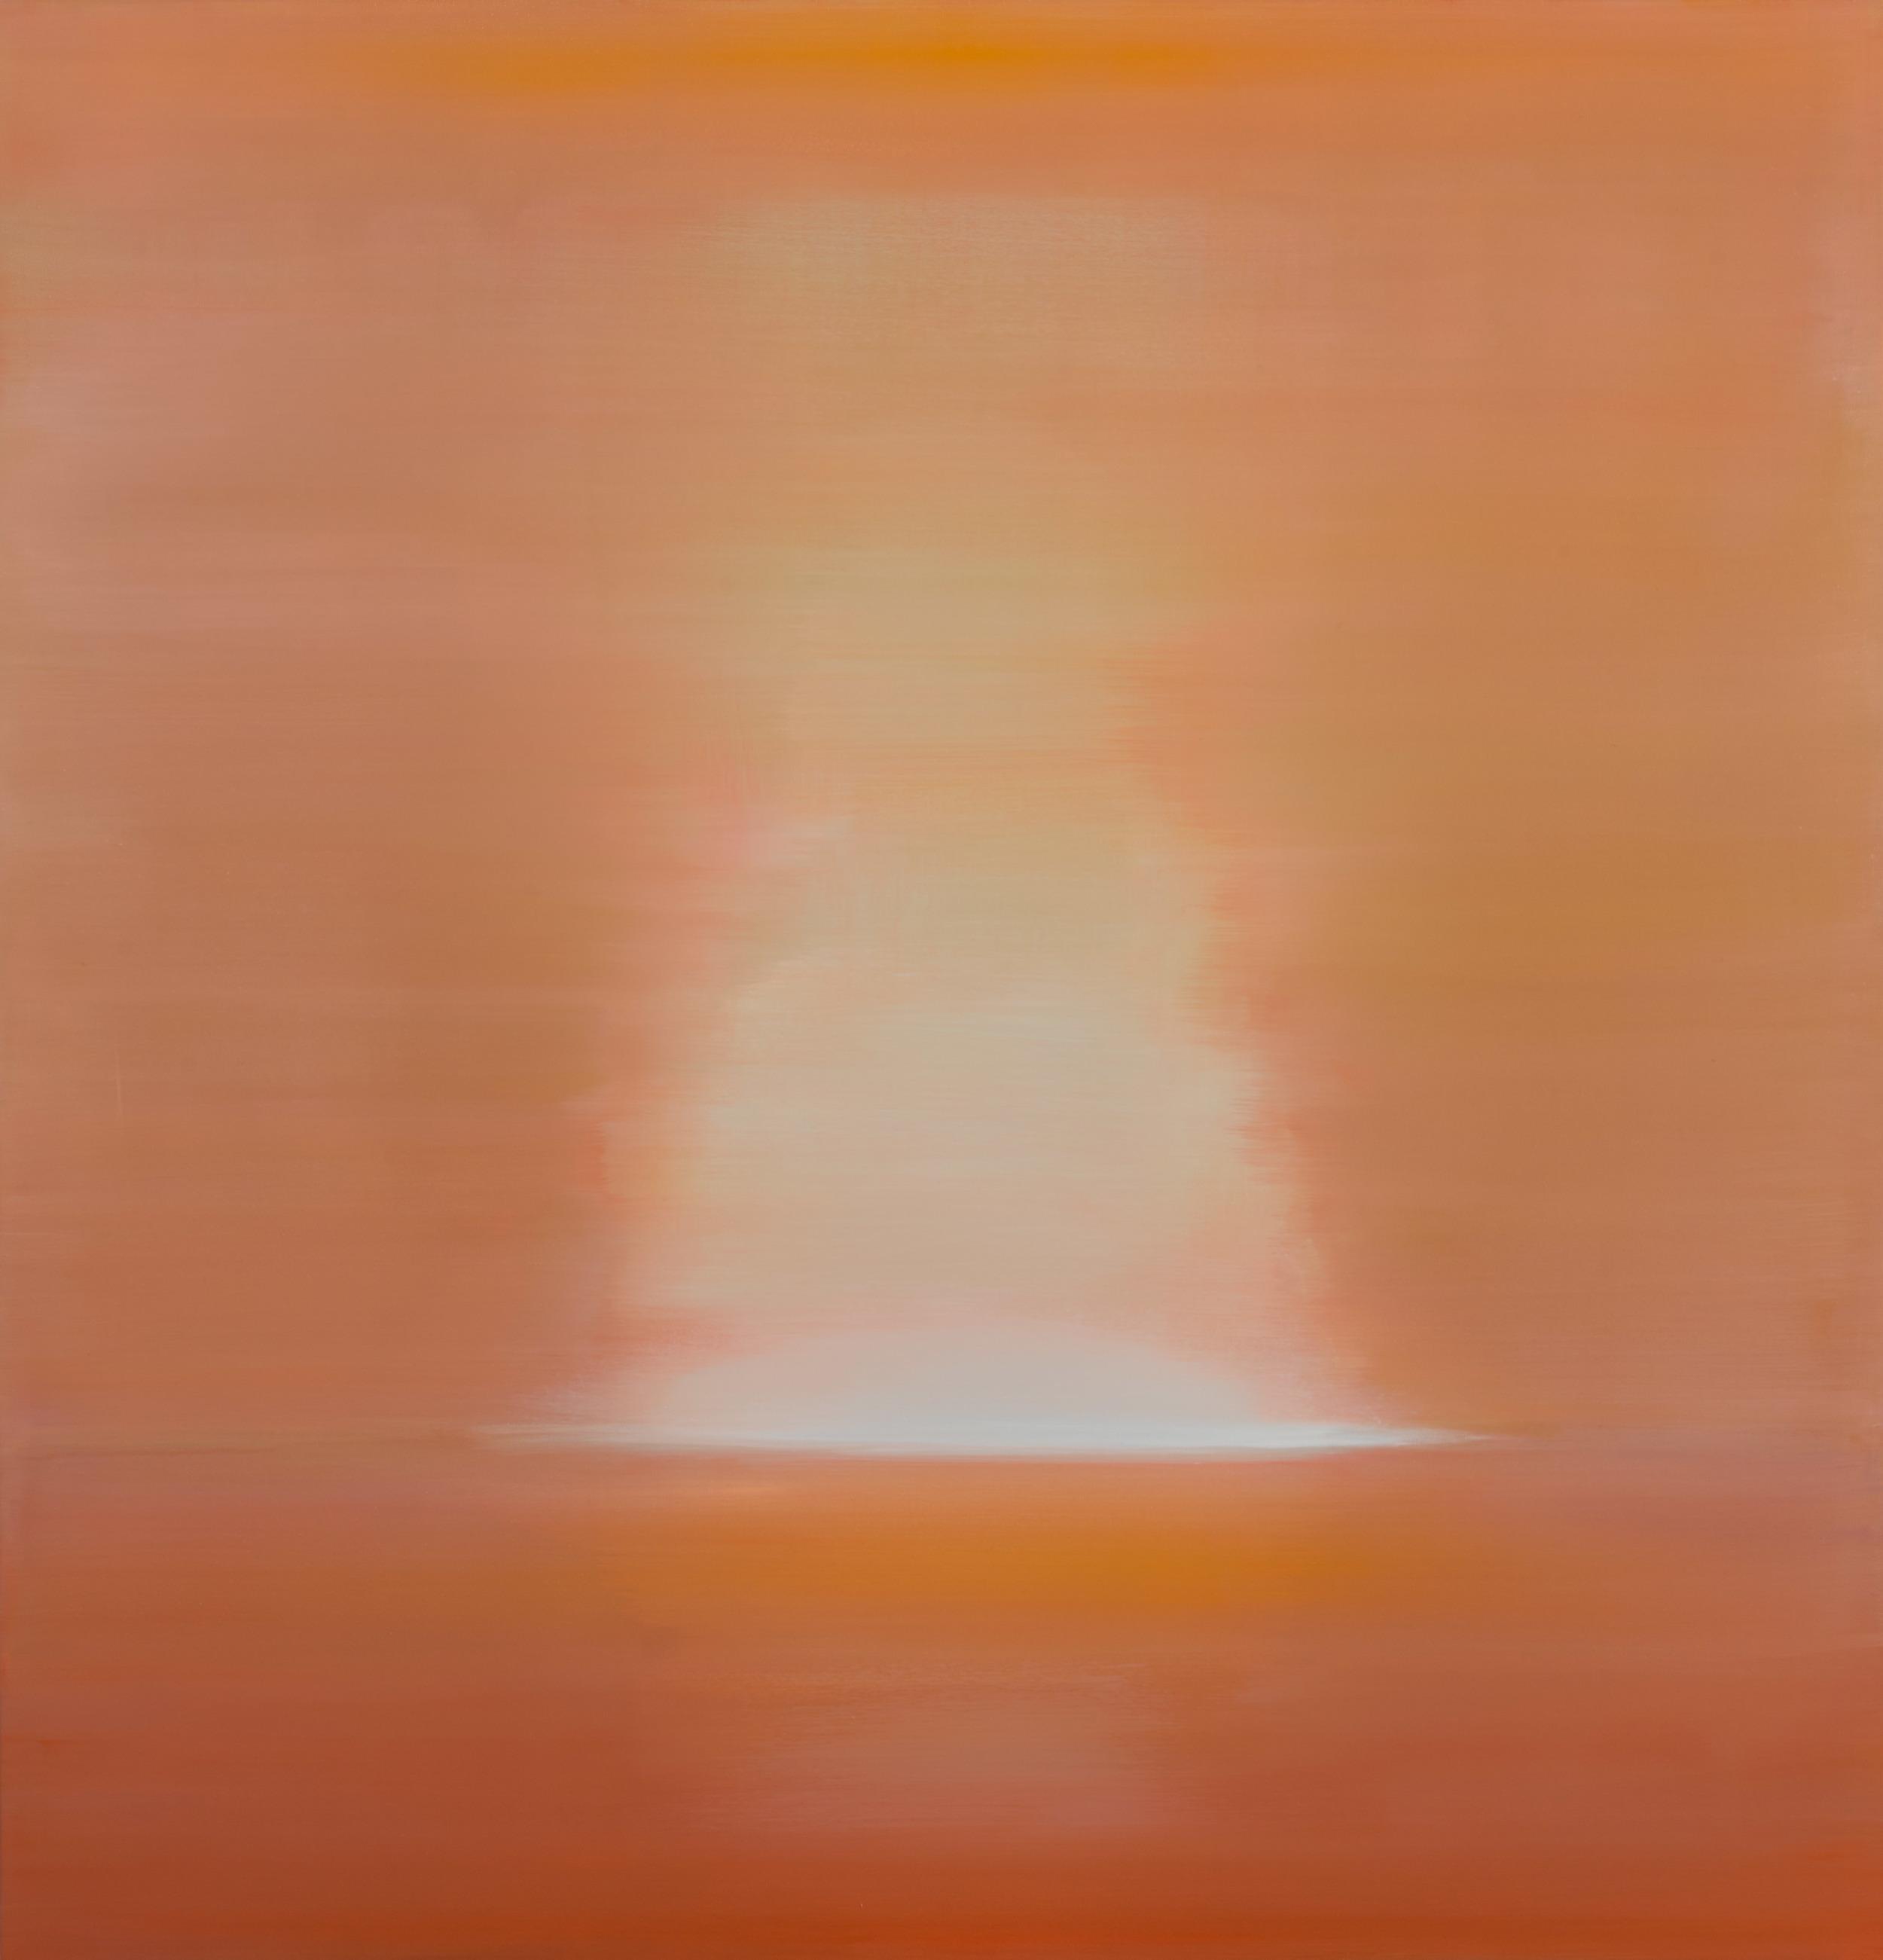 Sun,  oil on canvas, Meg Holgate, 2013.